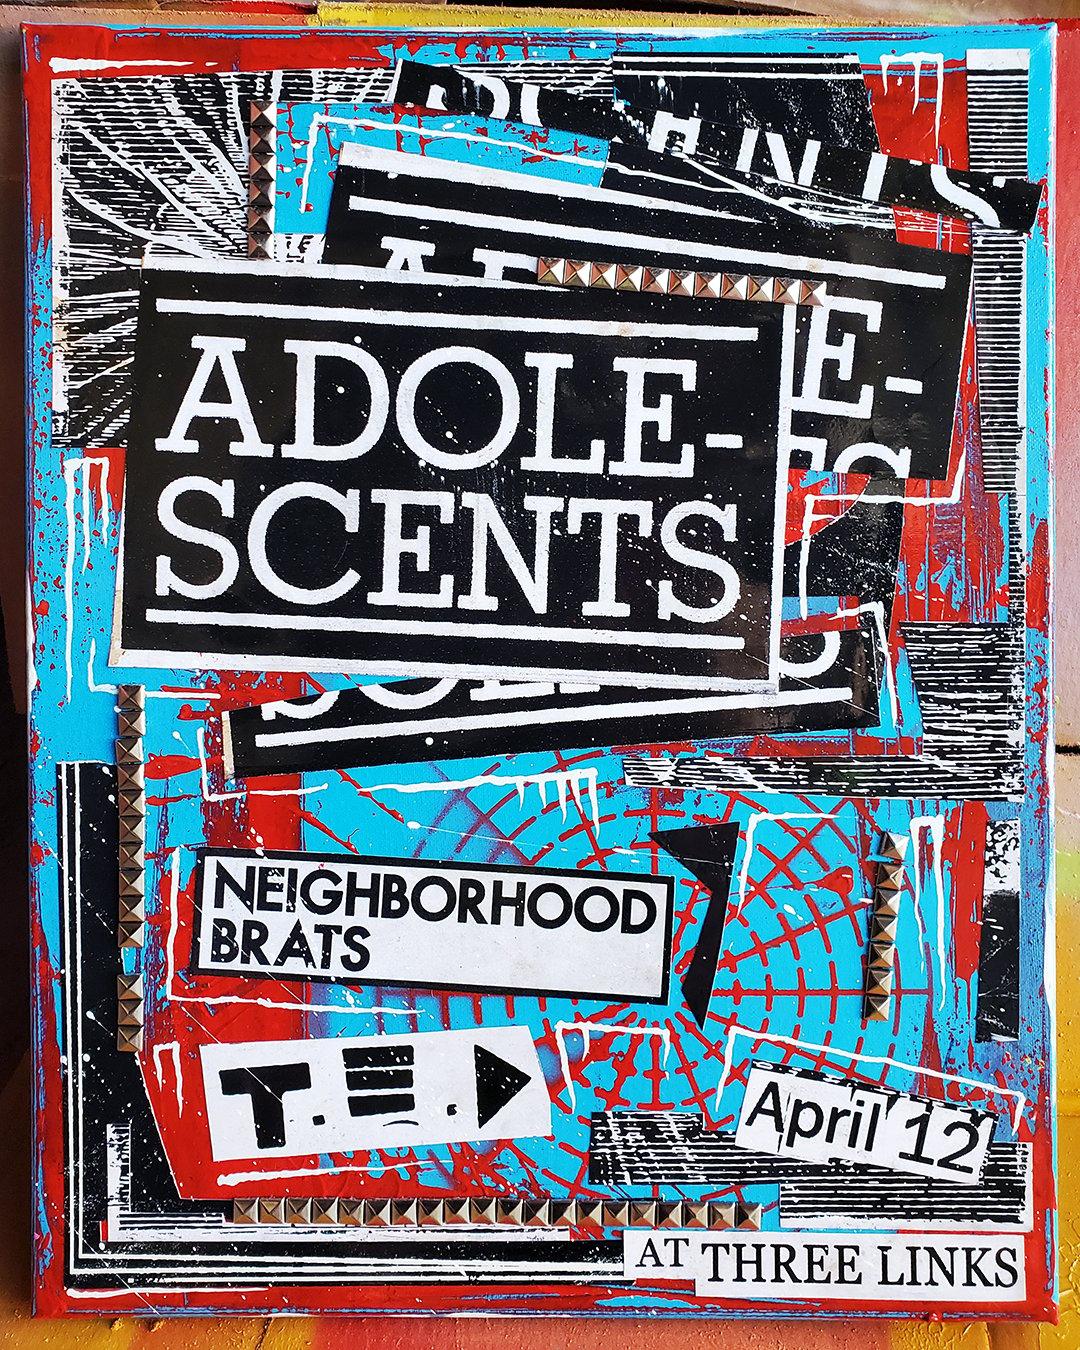 Adolescents 2019 (16x20 canvas)